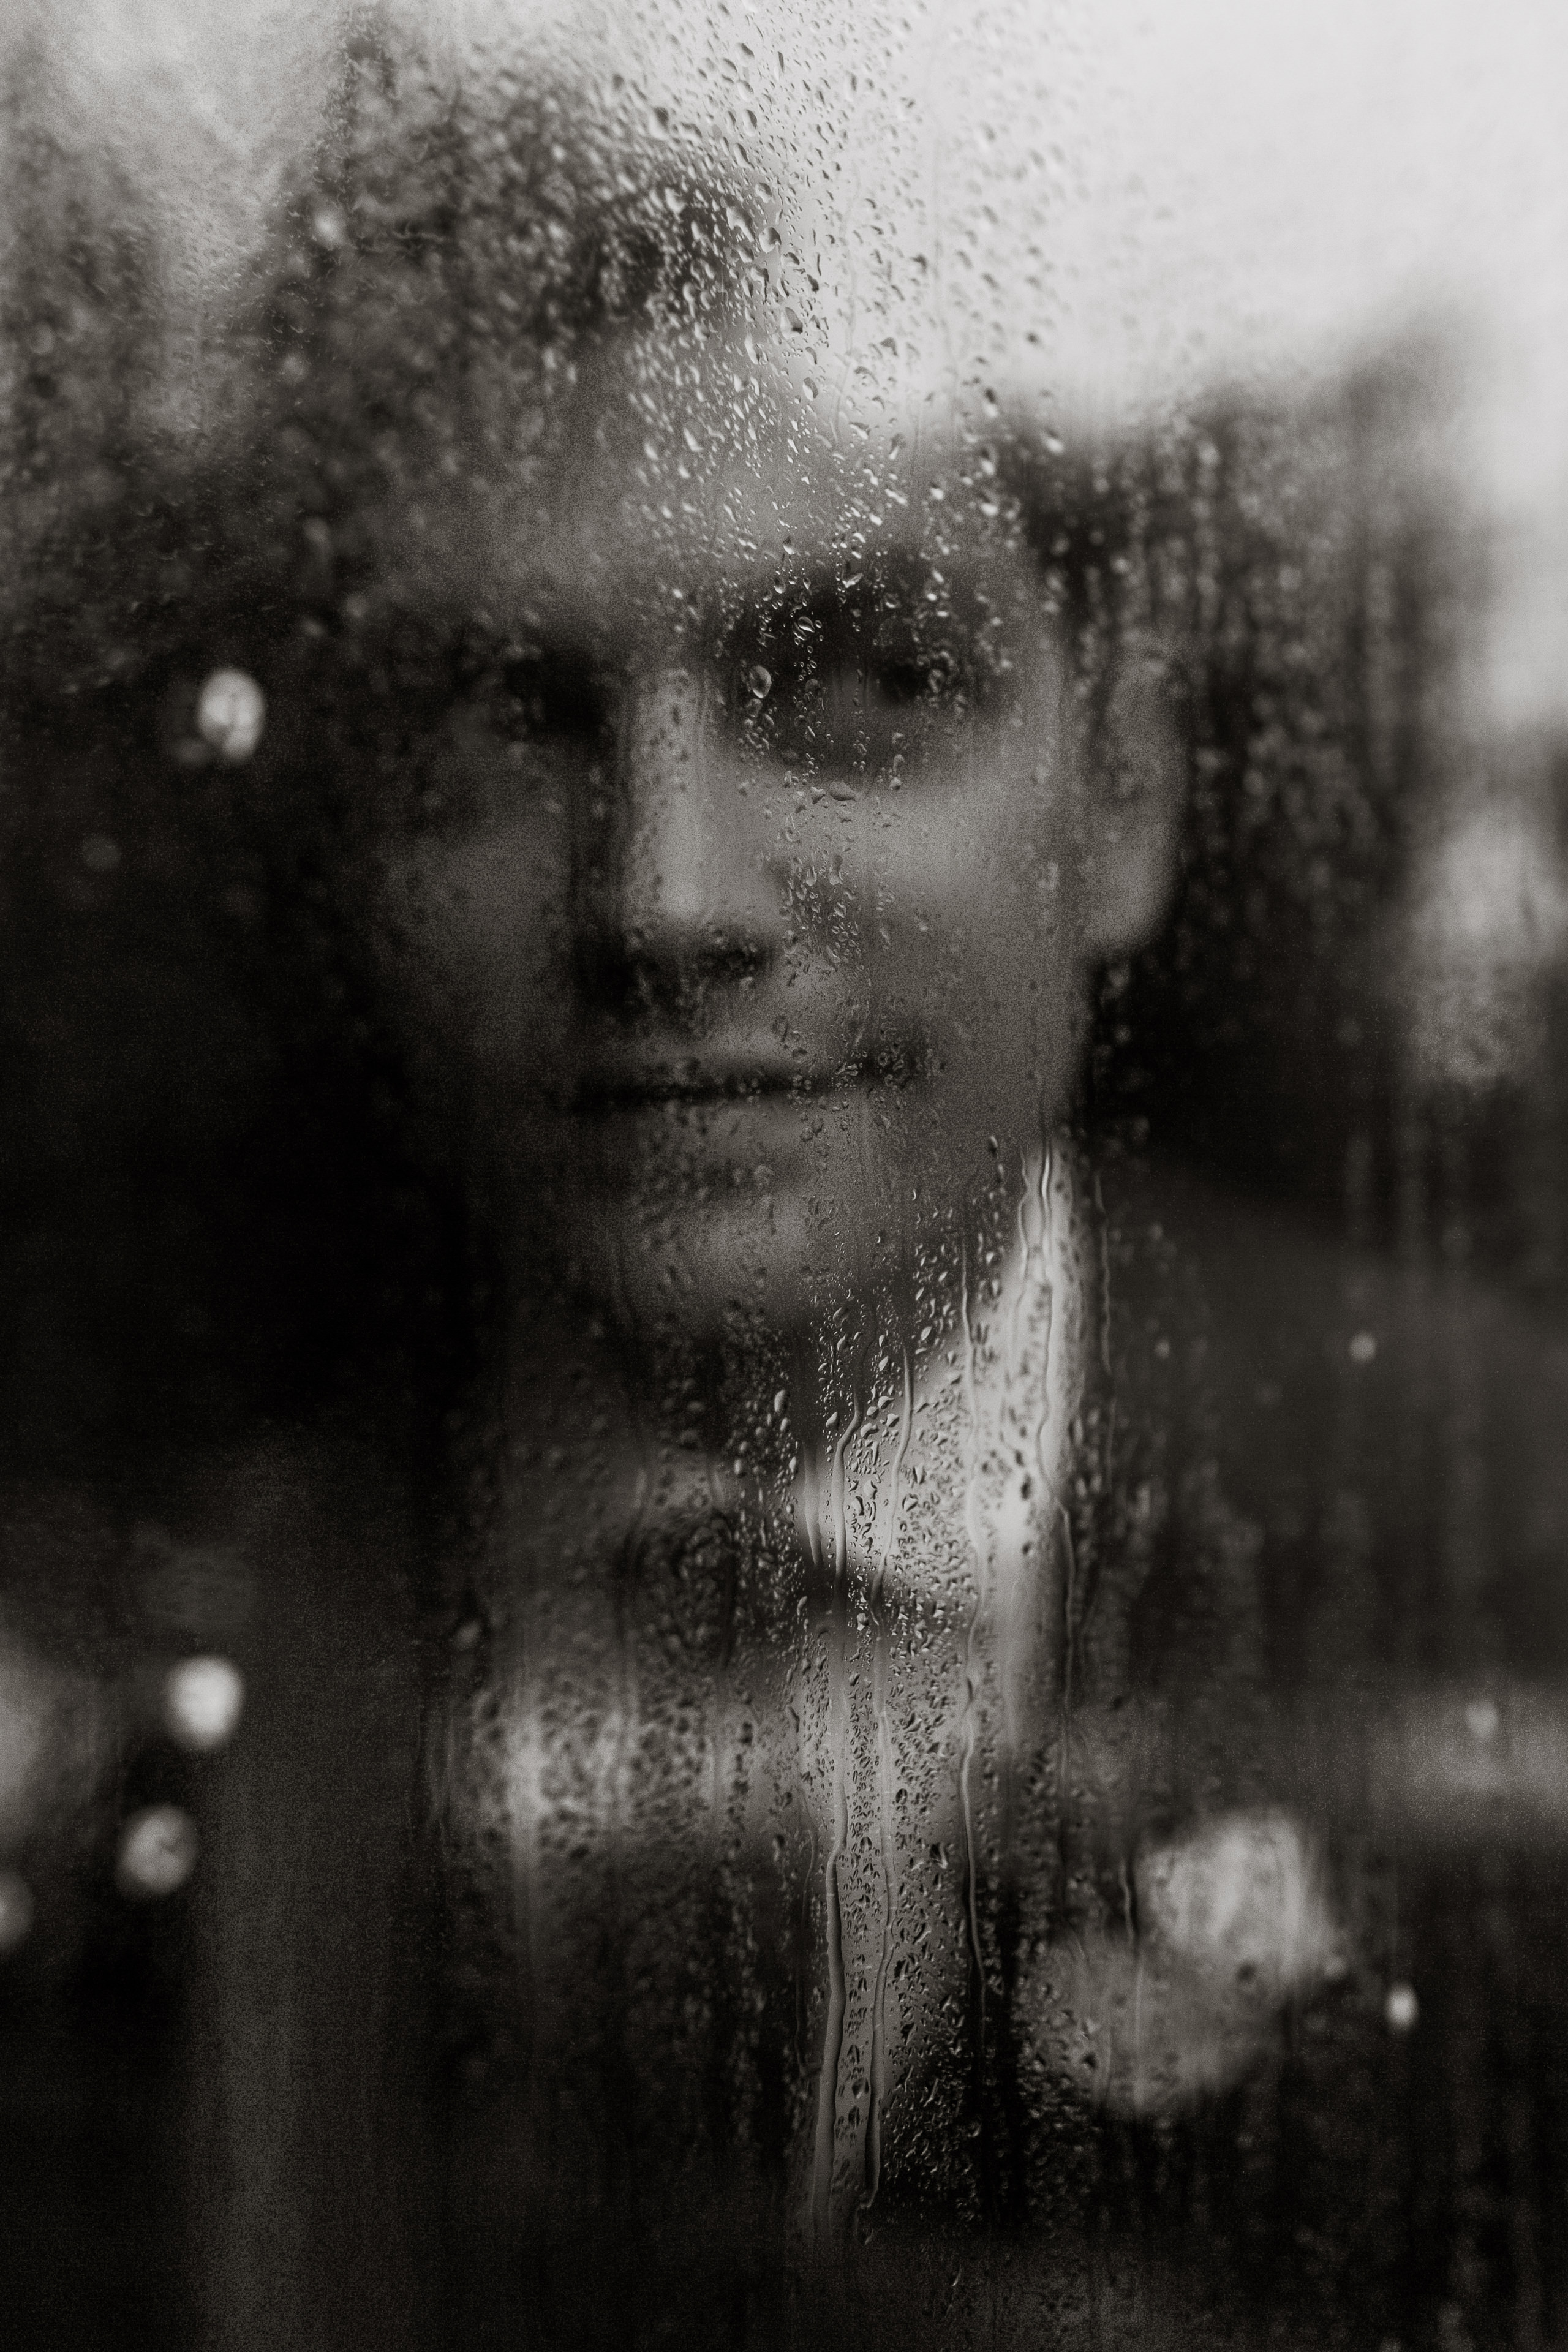 Groom seen through rainy windowpane - photo by Joel and Justyna